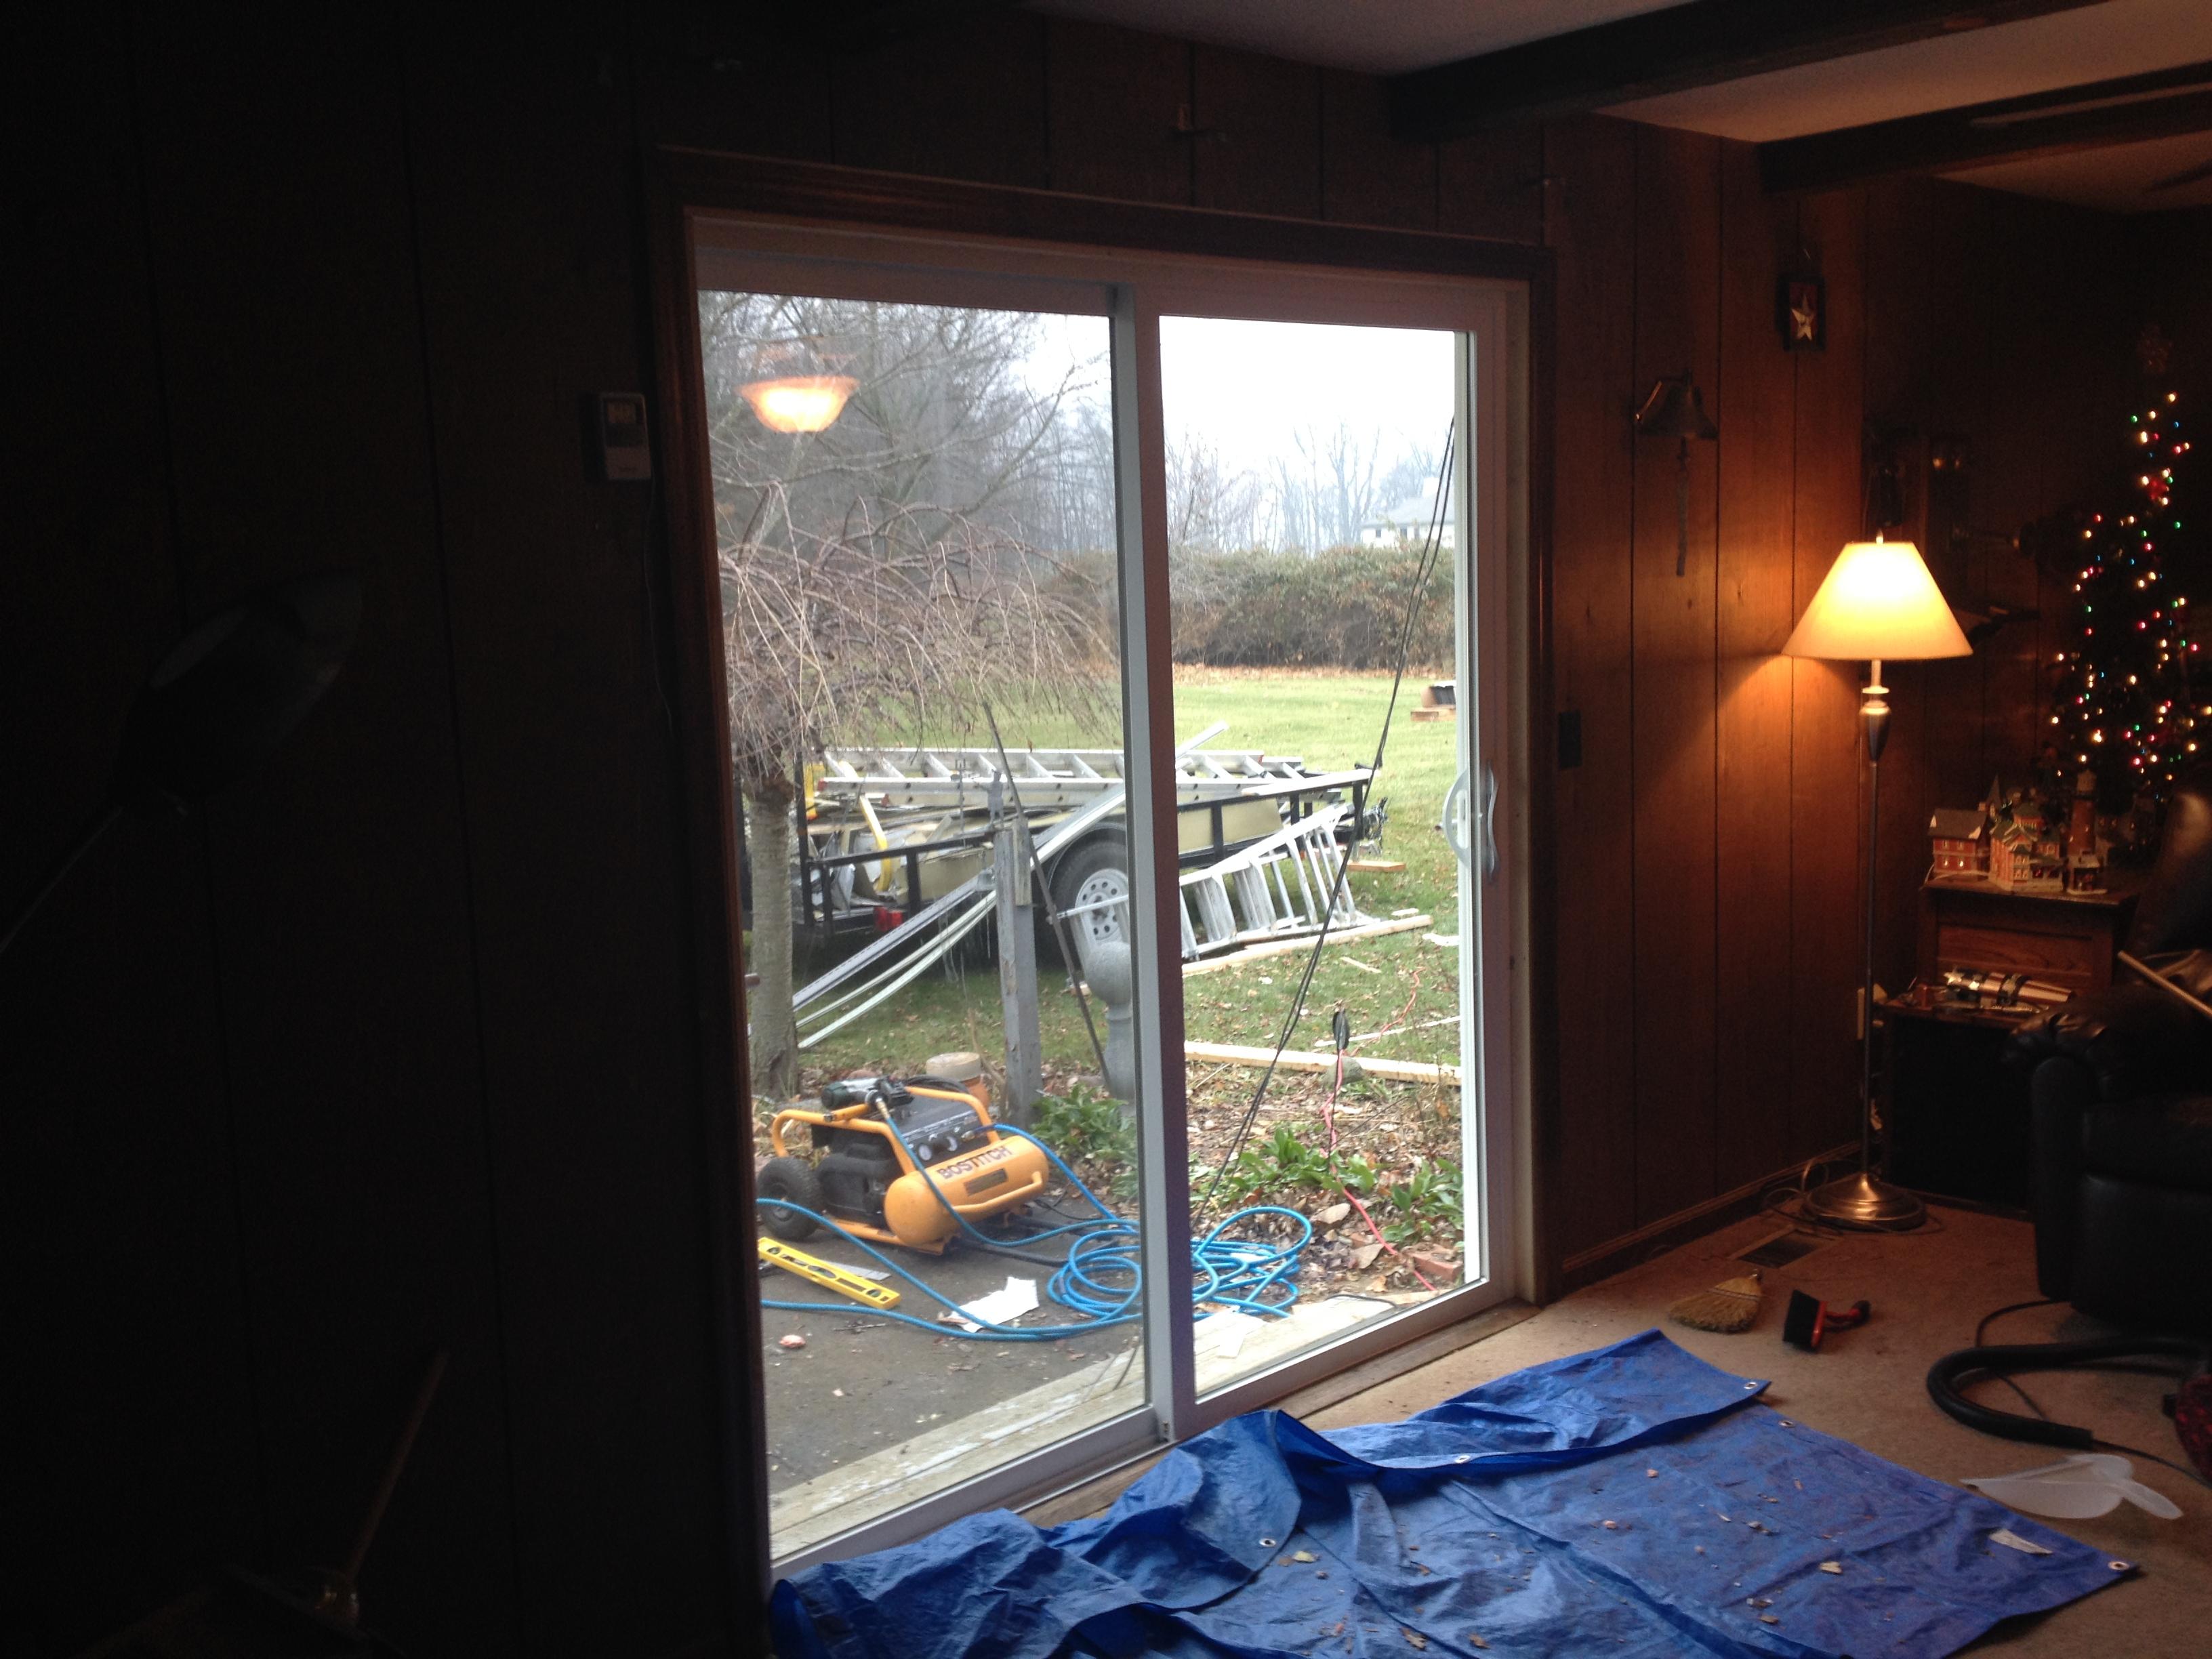 2448 #673A28 Jeld Wen Sliding Patio Door Installation U2013 Edgerton Ohio Pic Retrofit  Patio Doors